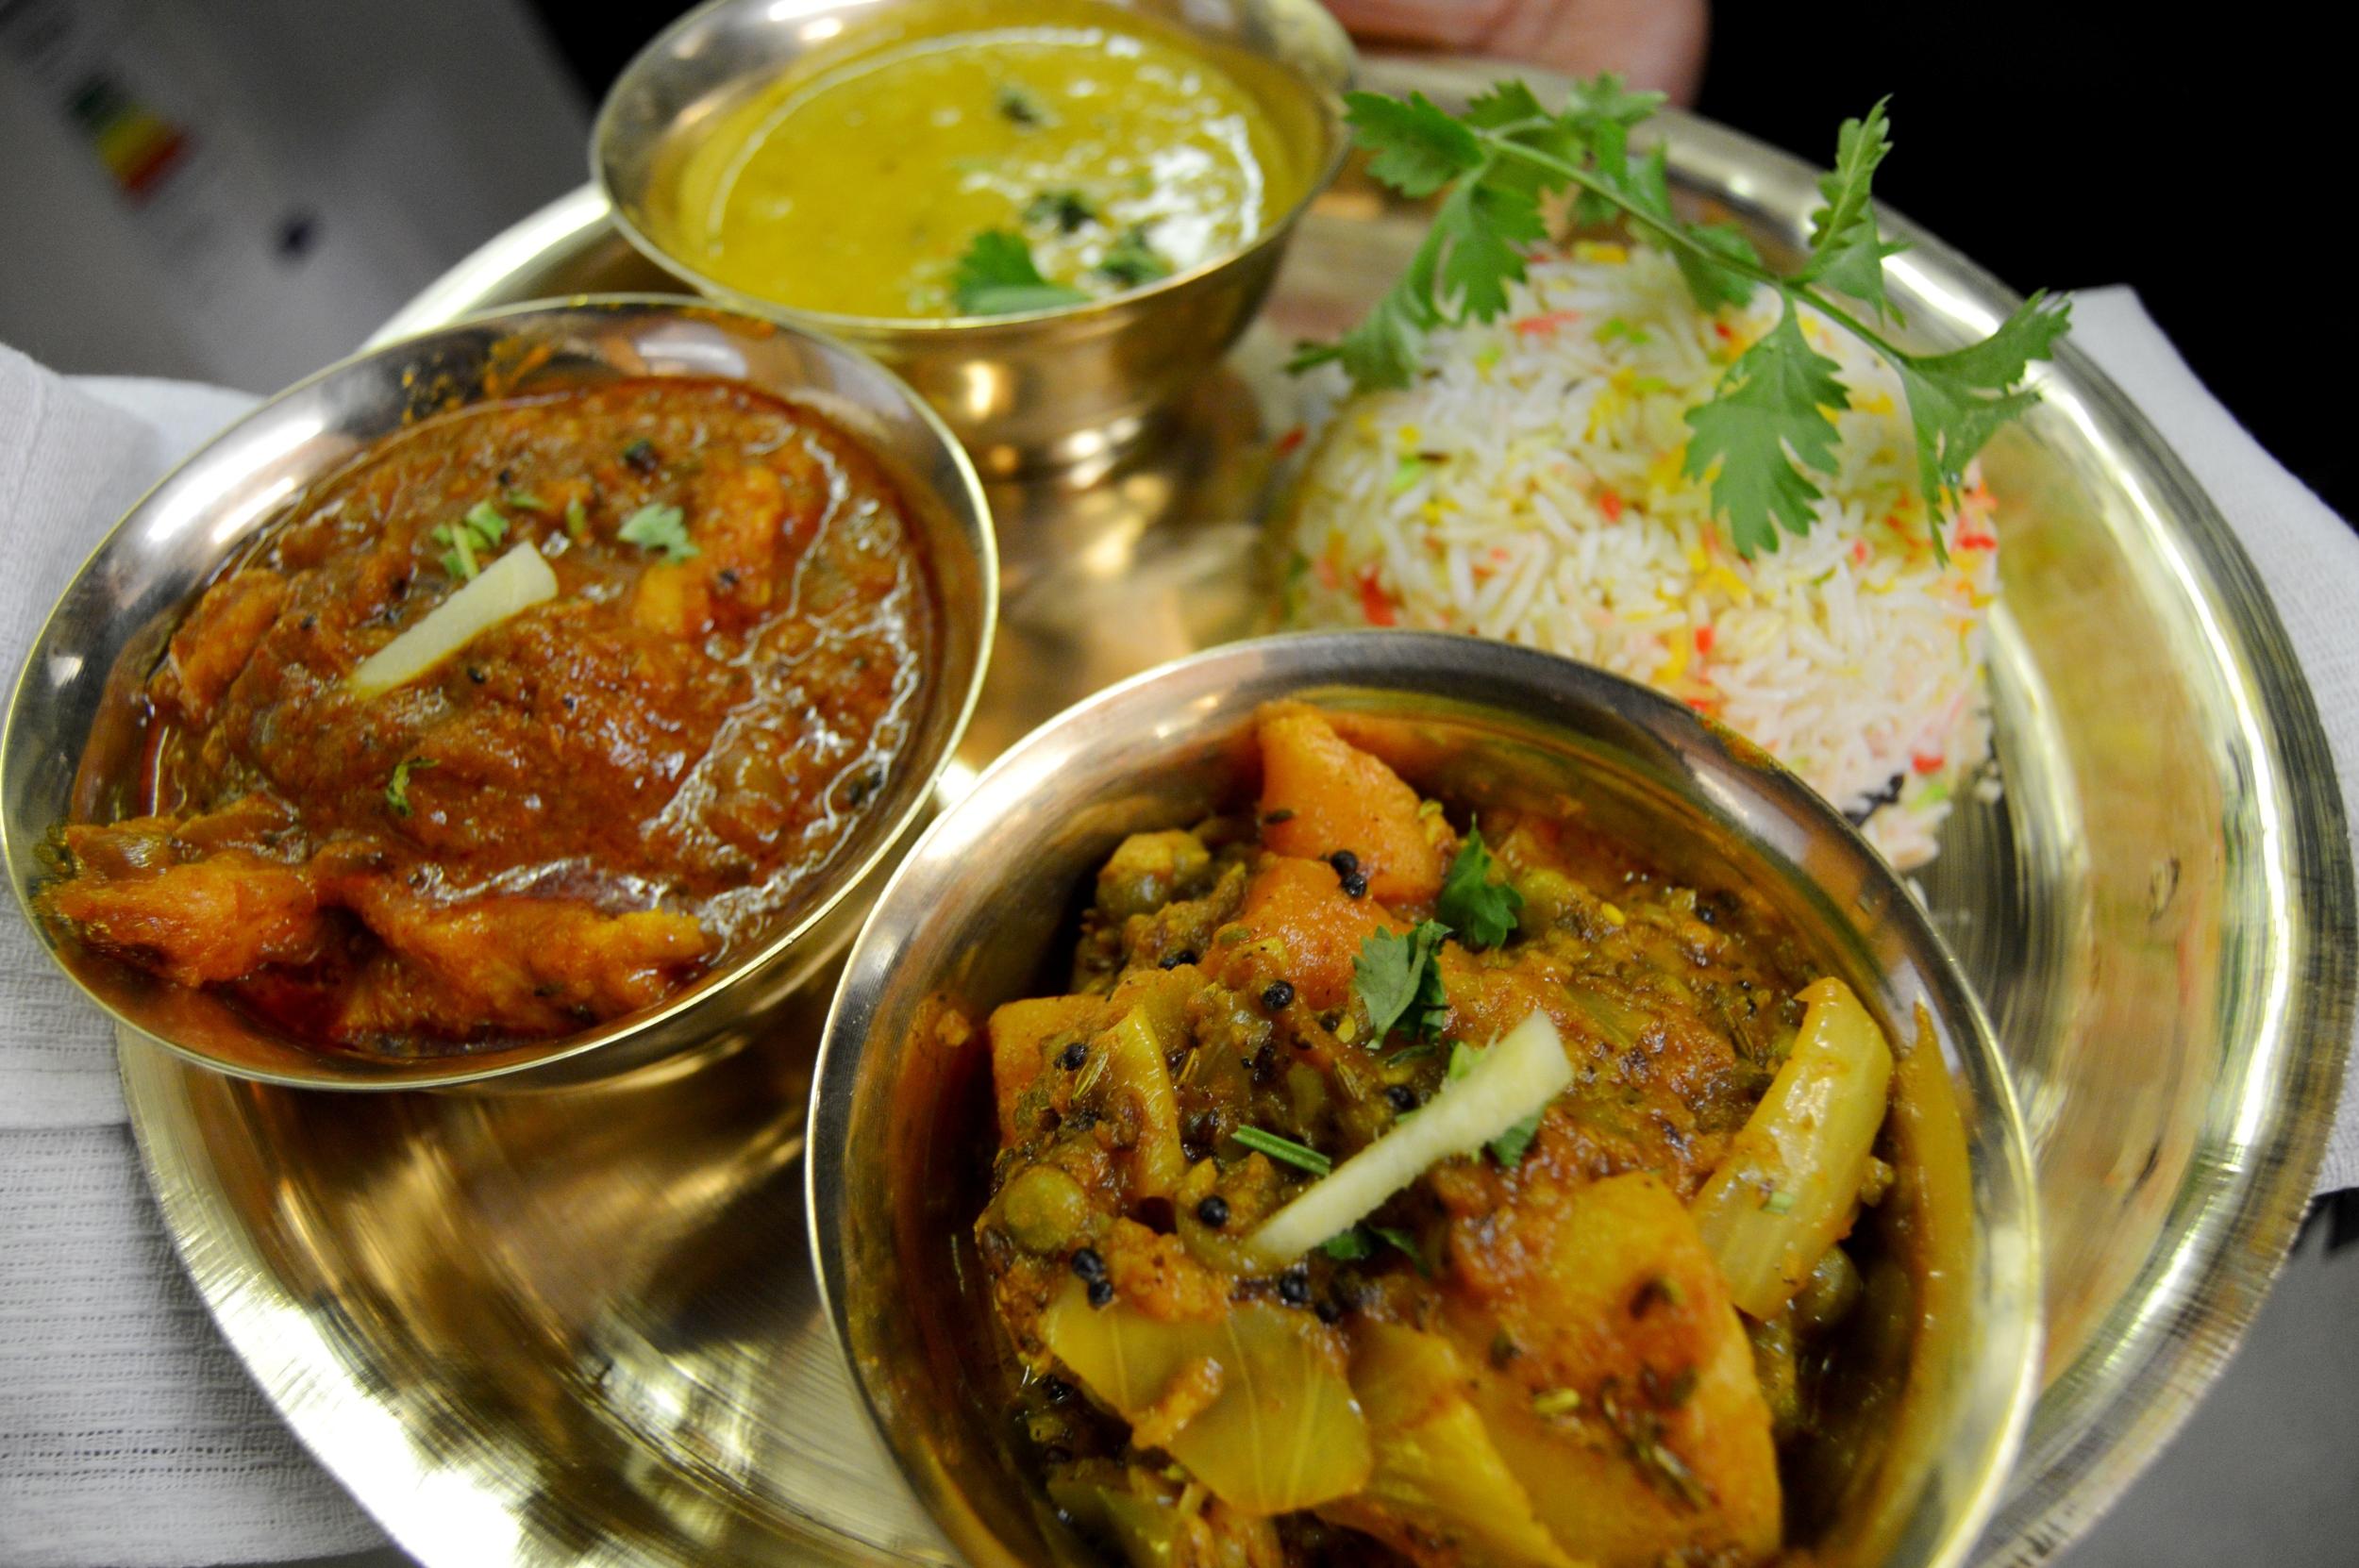 Gurkha Dining Nepalese and Indian Cuisine Restaurant